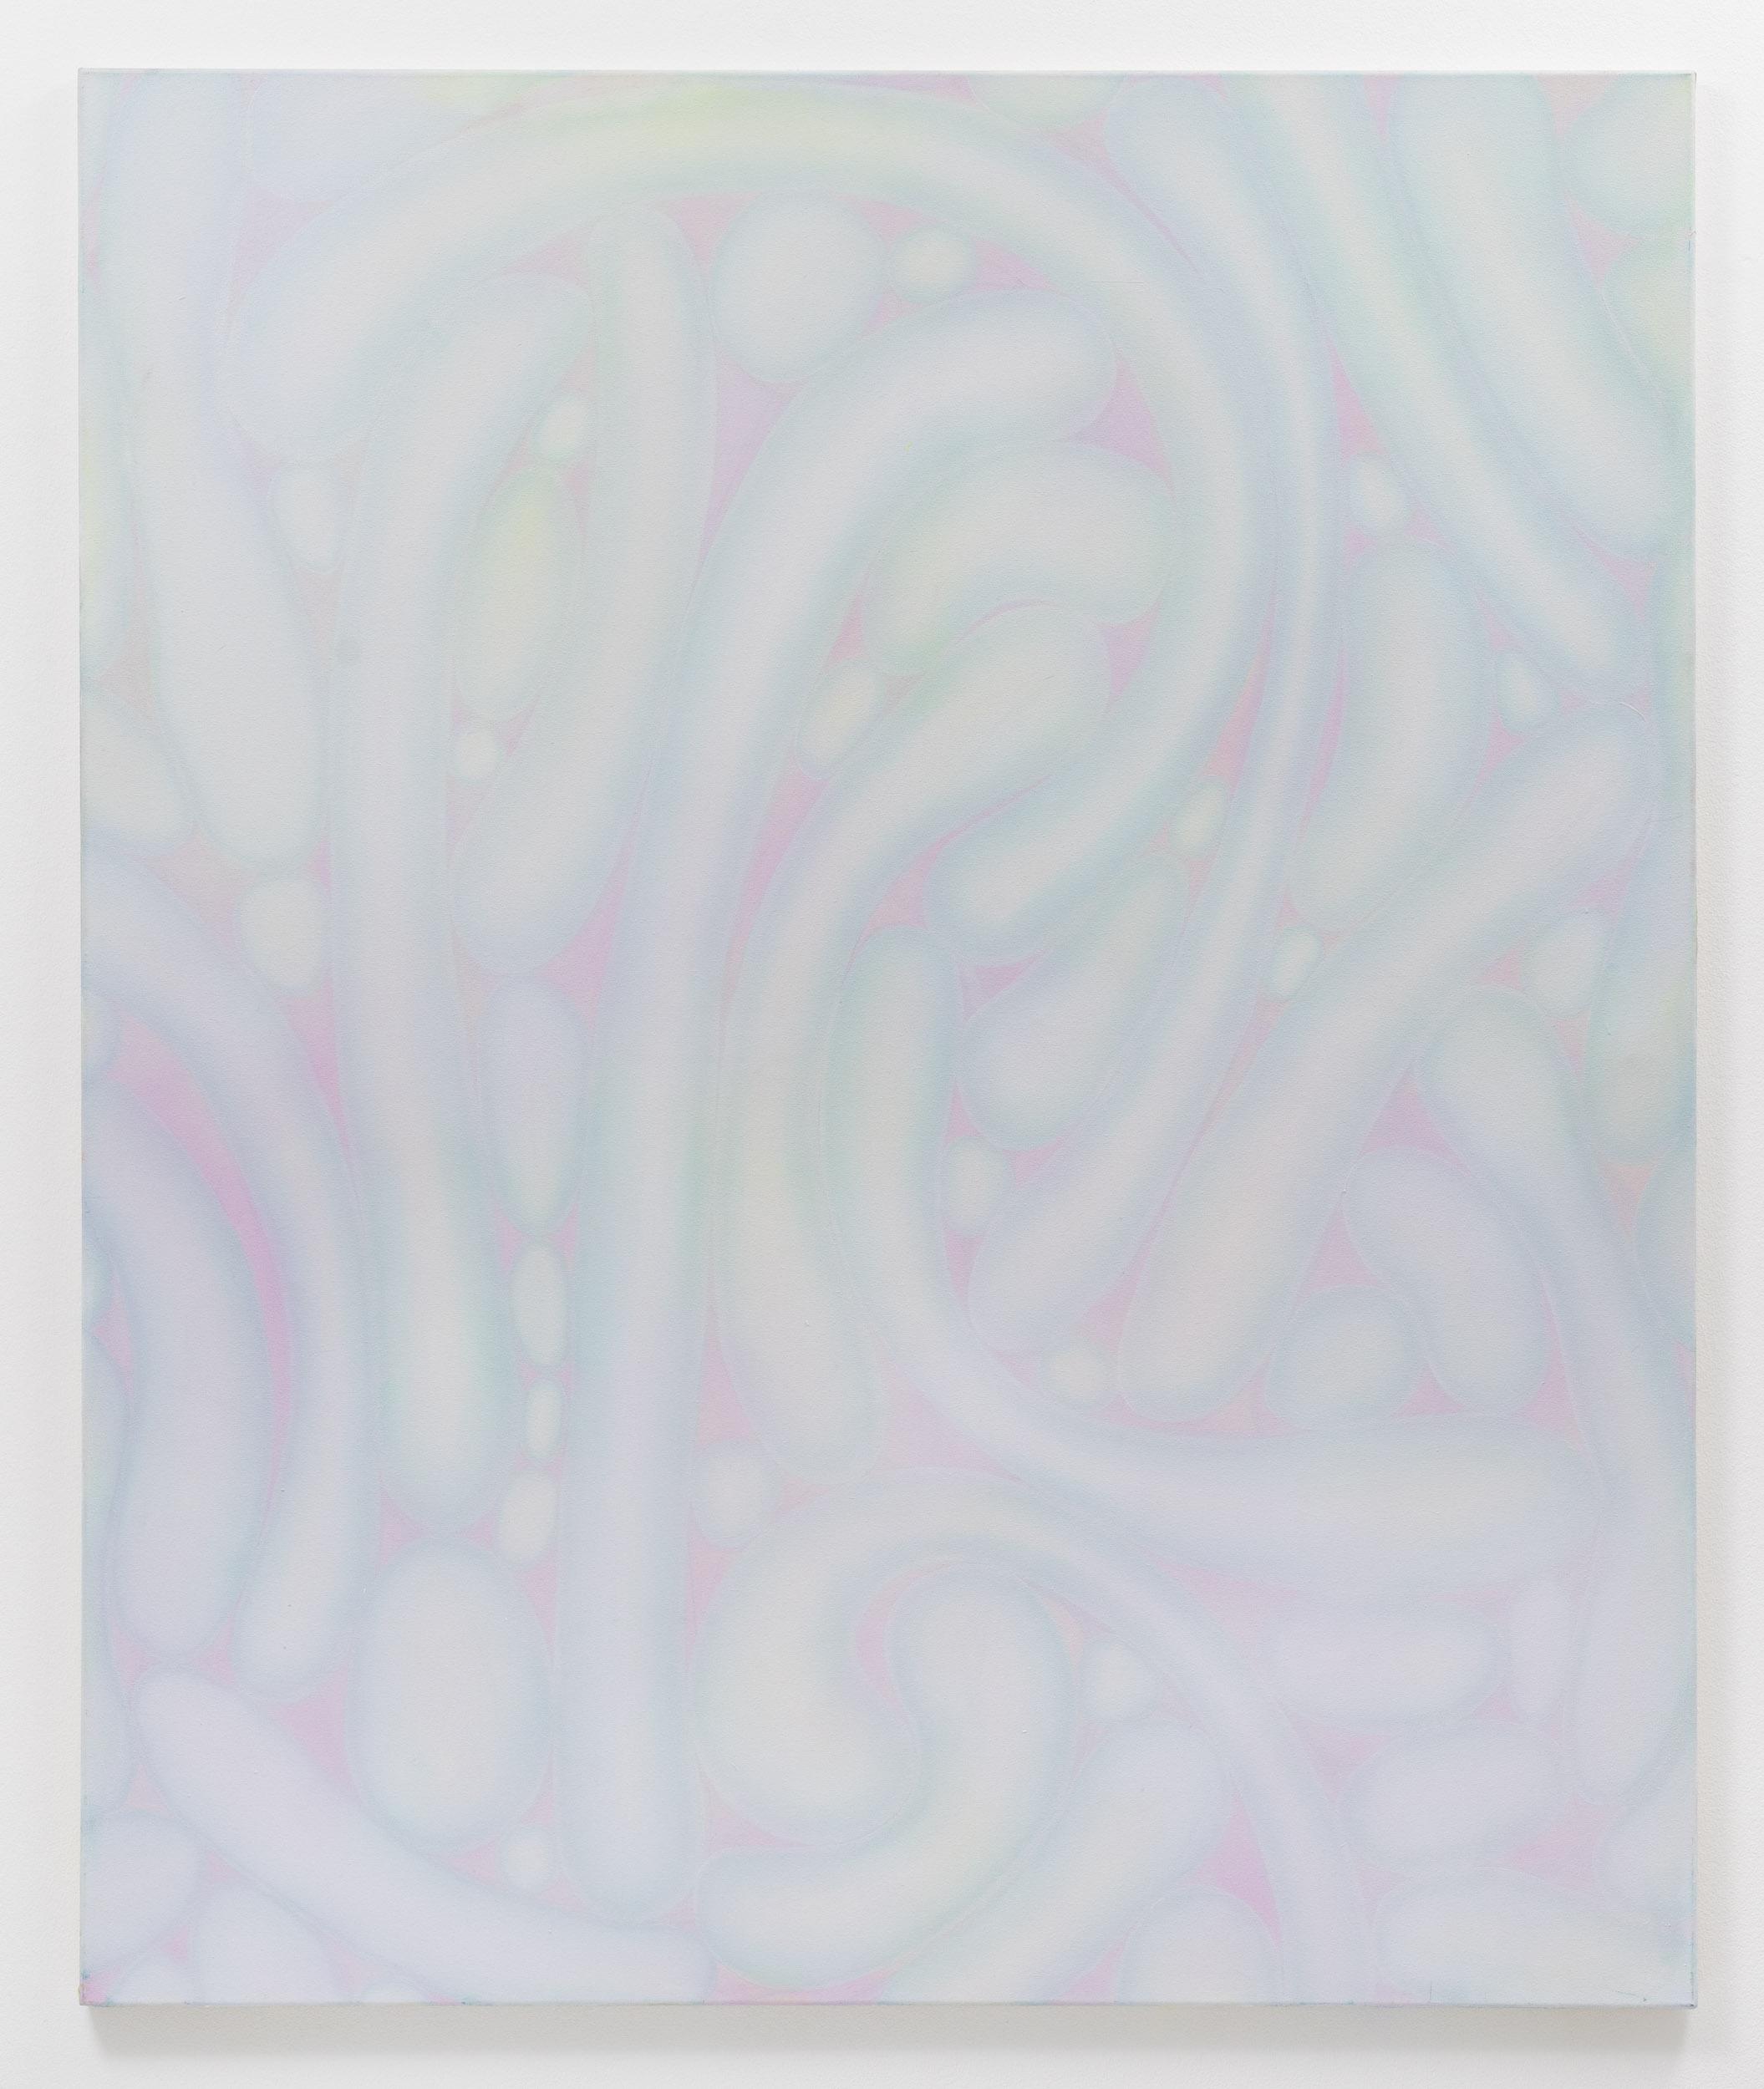 Deep, 2017, 180x150cm, Öl auf Leinwand